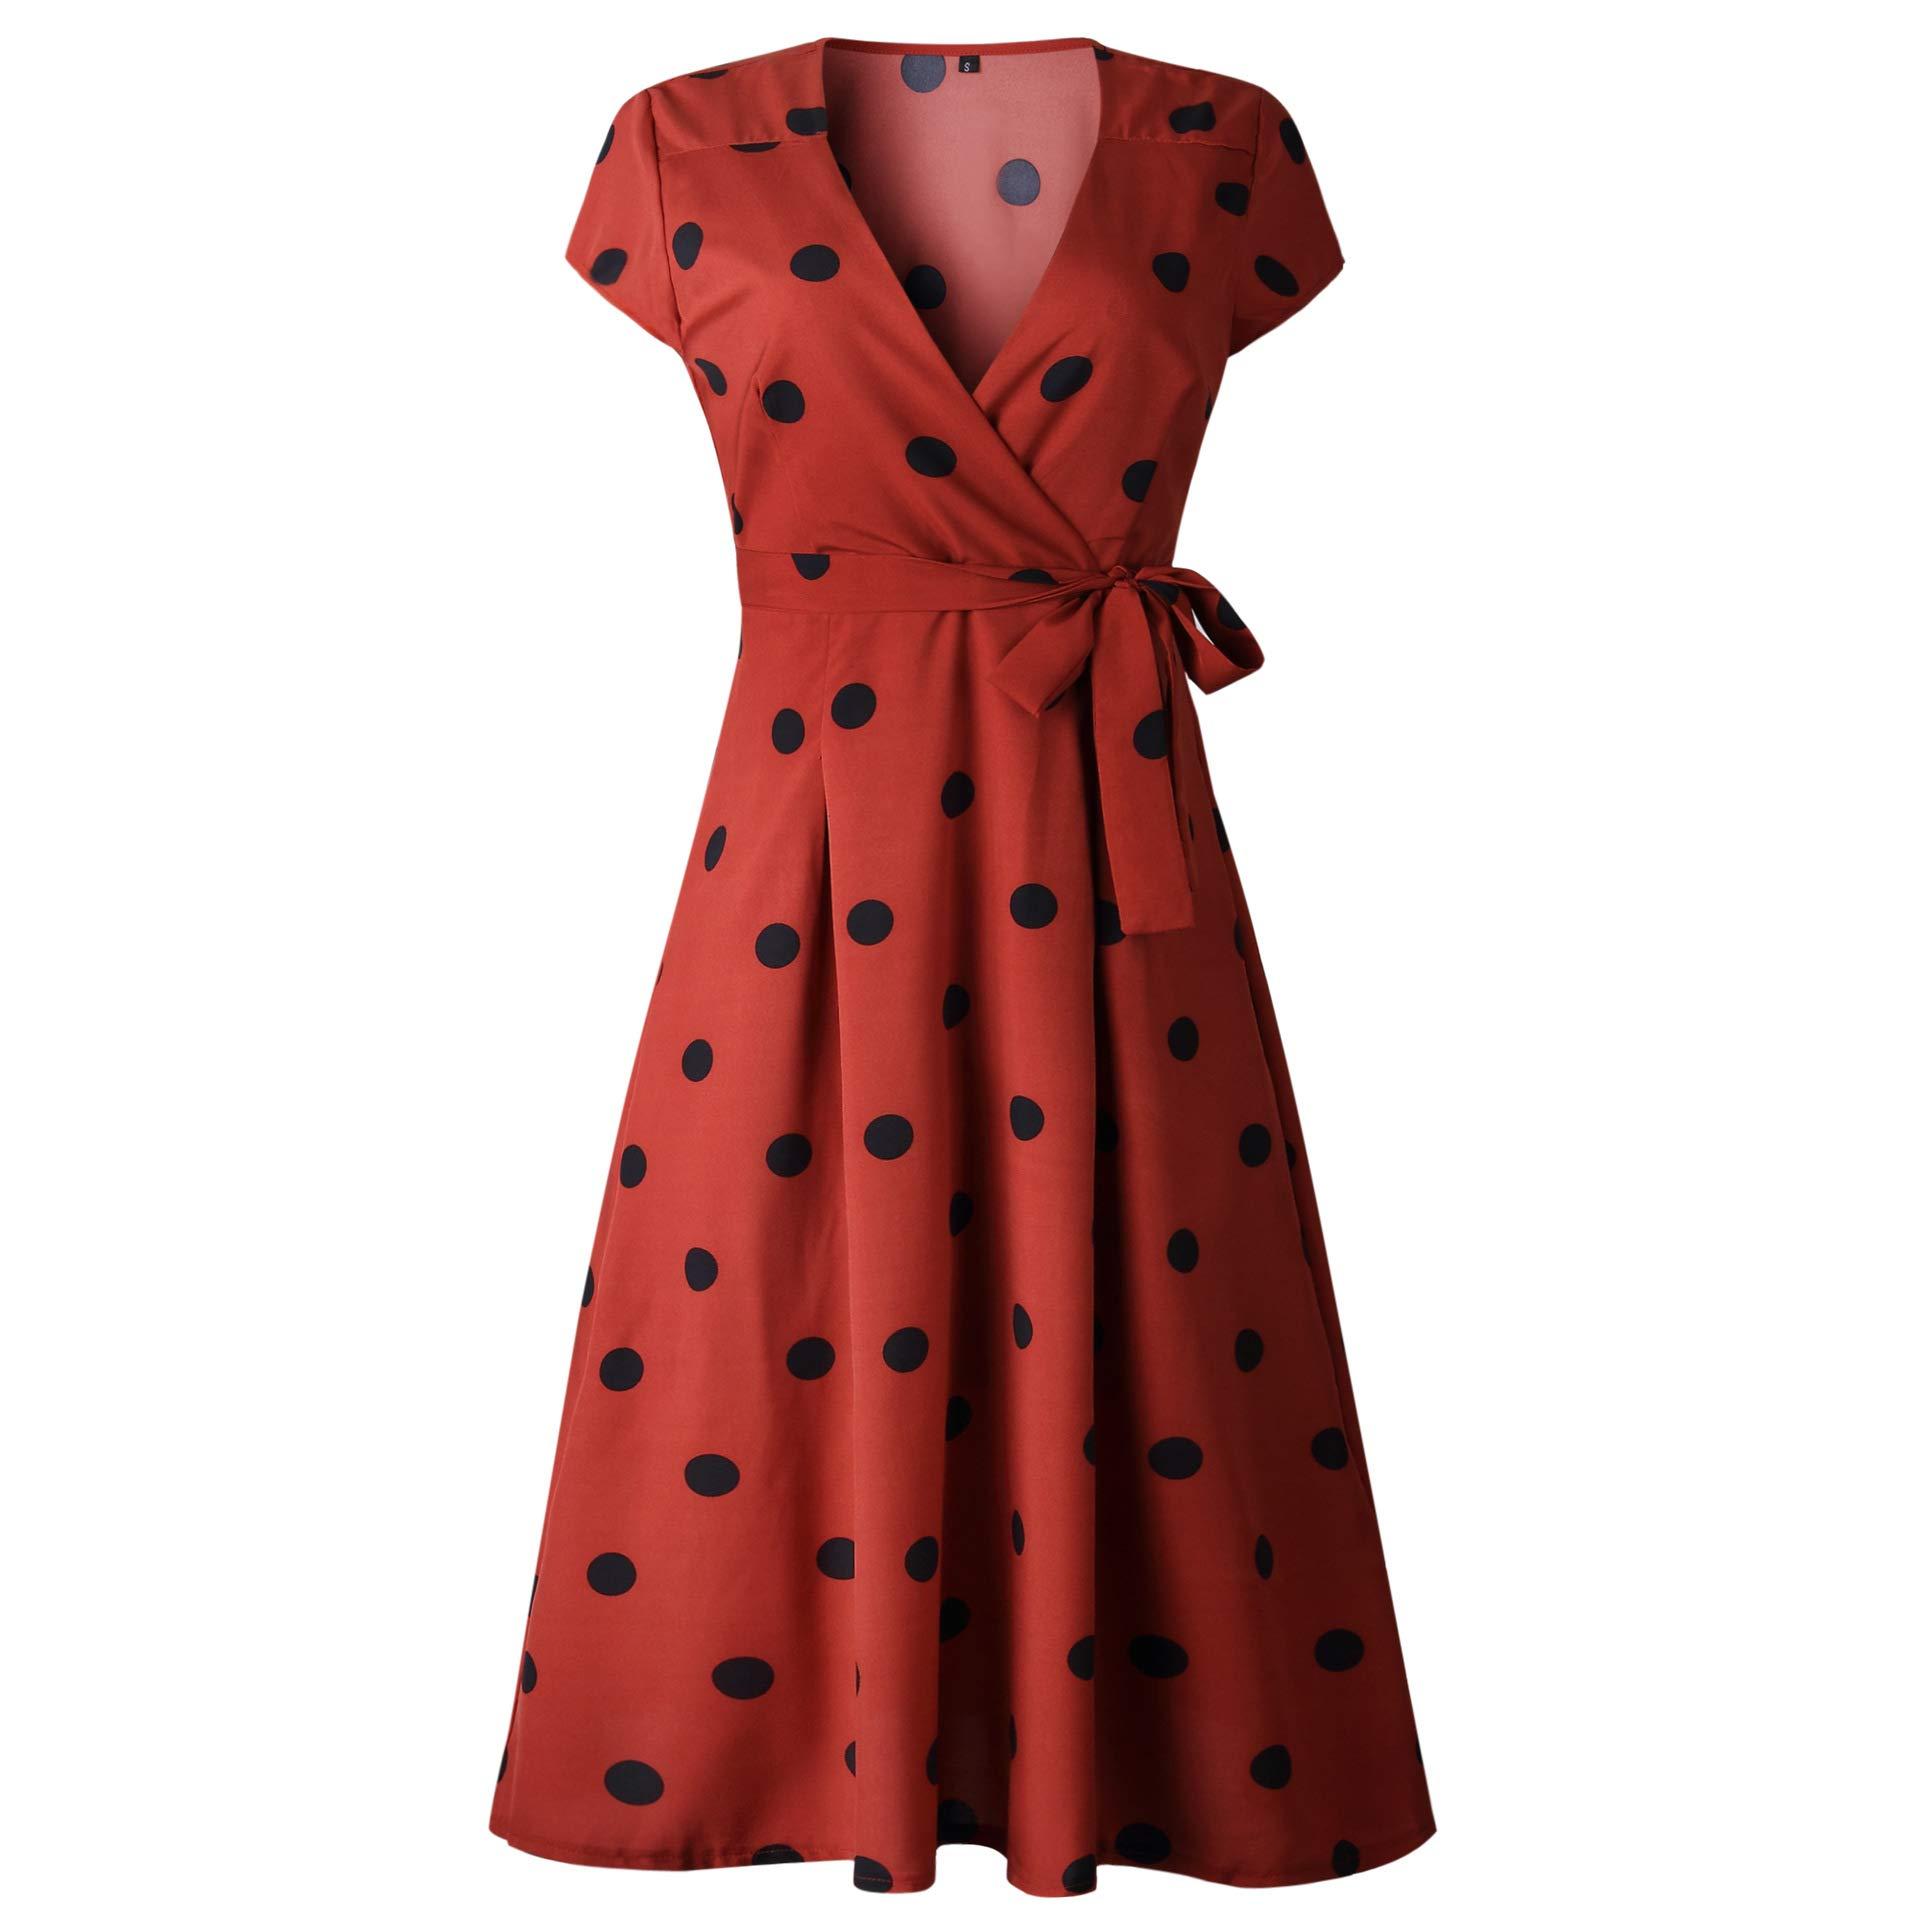 Women\'s Polka Dot Dress Vintage V Neck Pleated Wrap Dress A-Line Swing Midi Dress with Belt Brick Red L